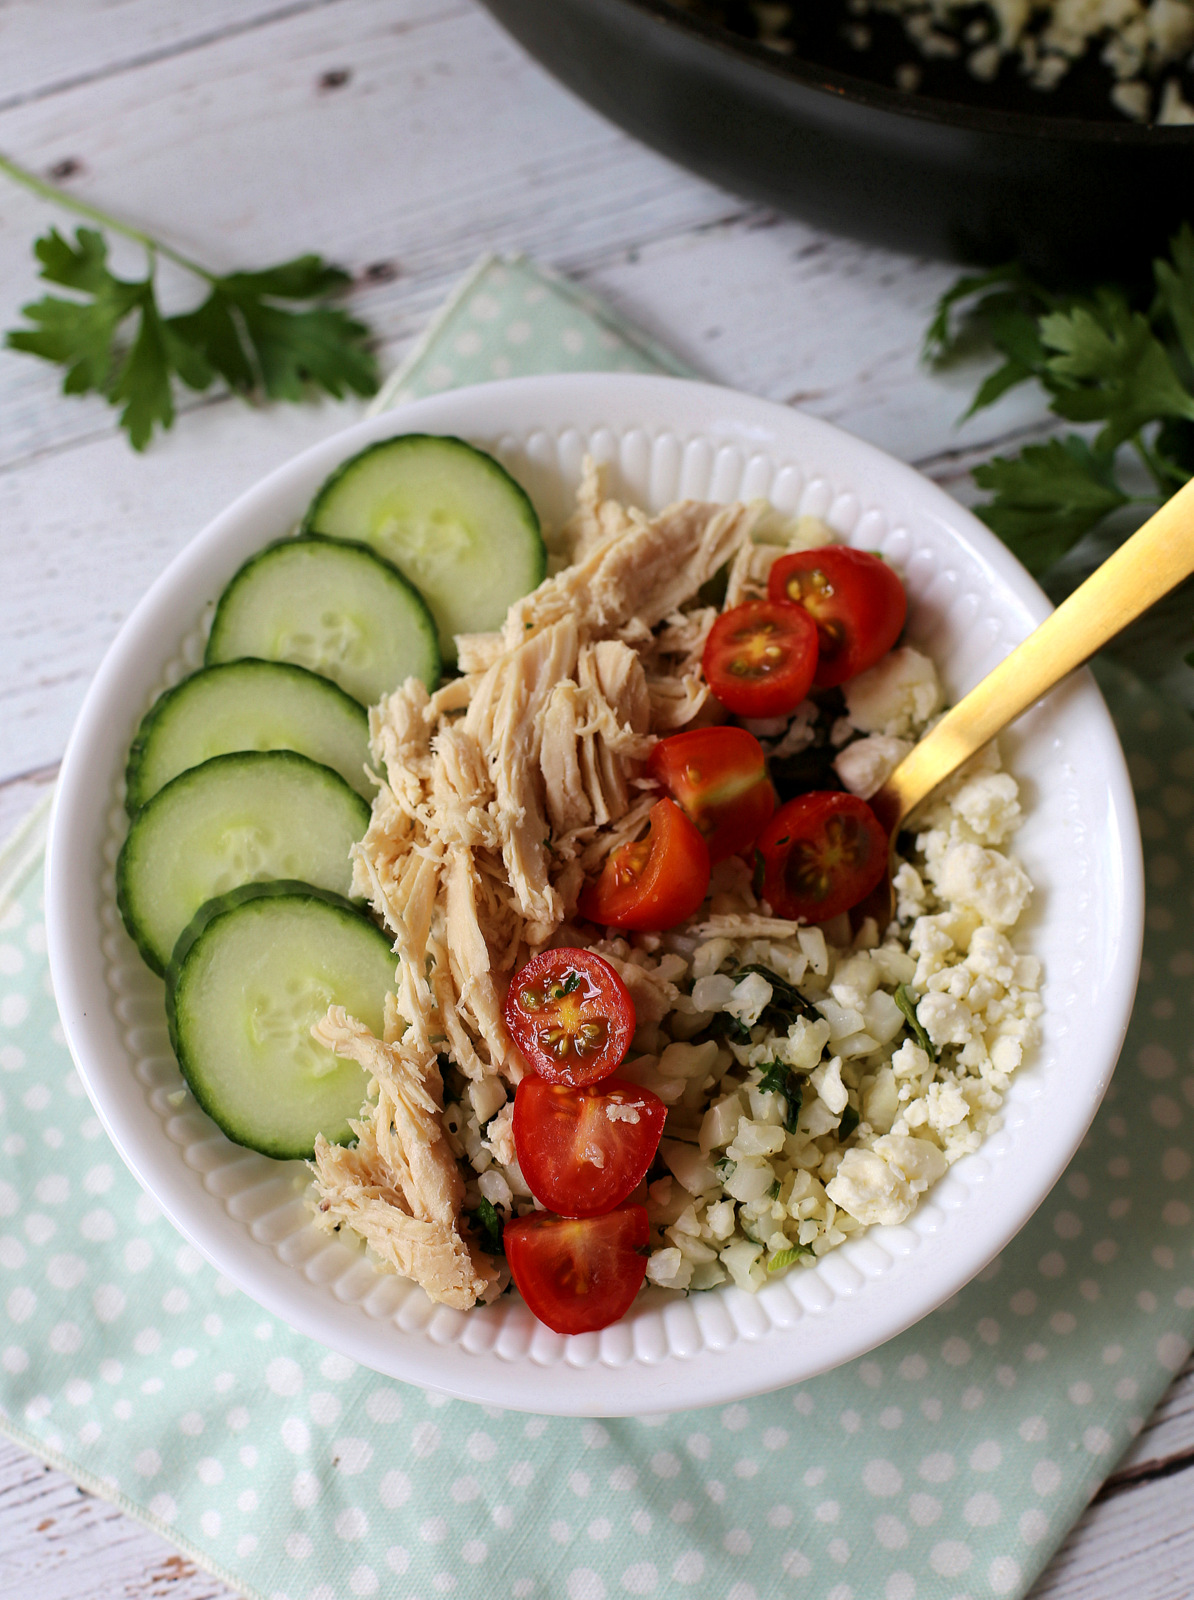 Zoes Kitchen Cauliflower Rice Recipe Bright and